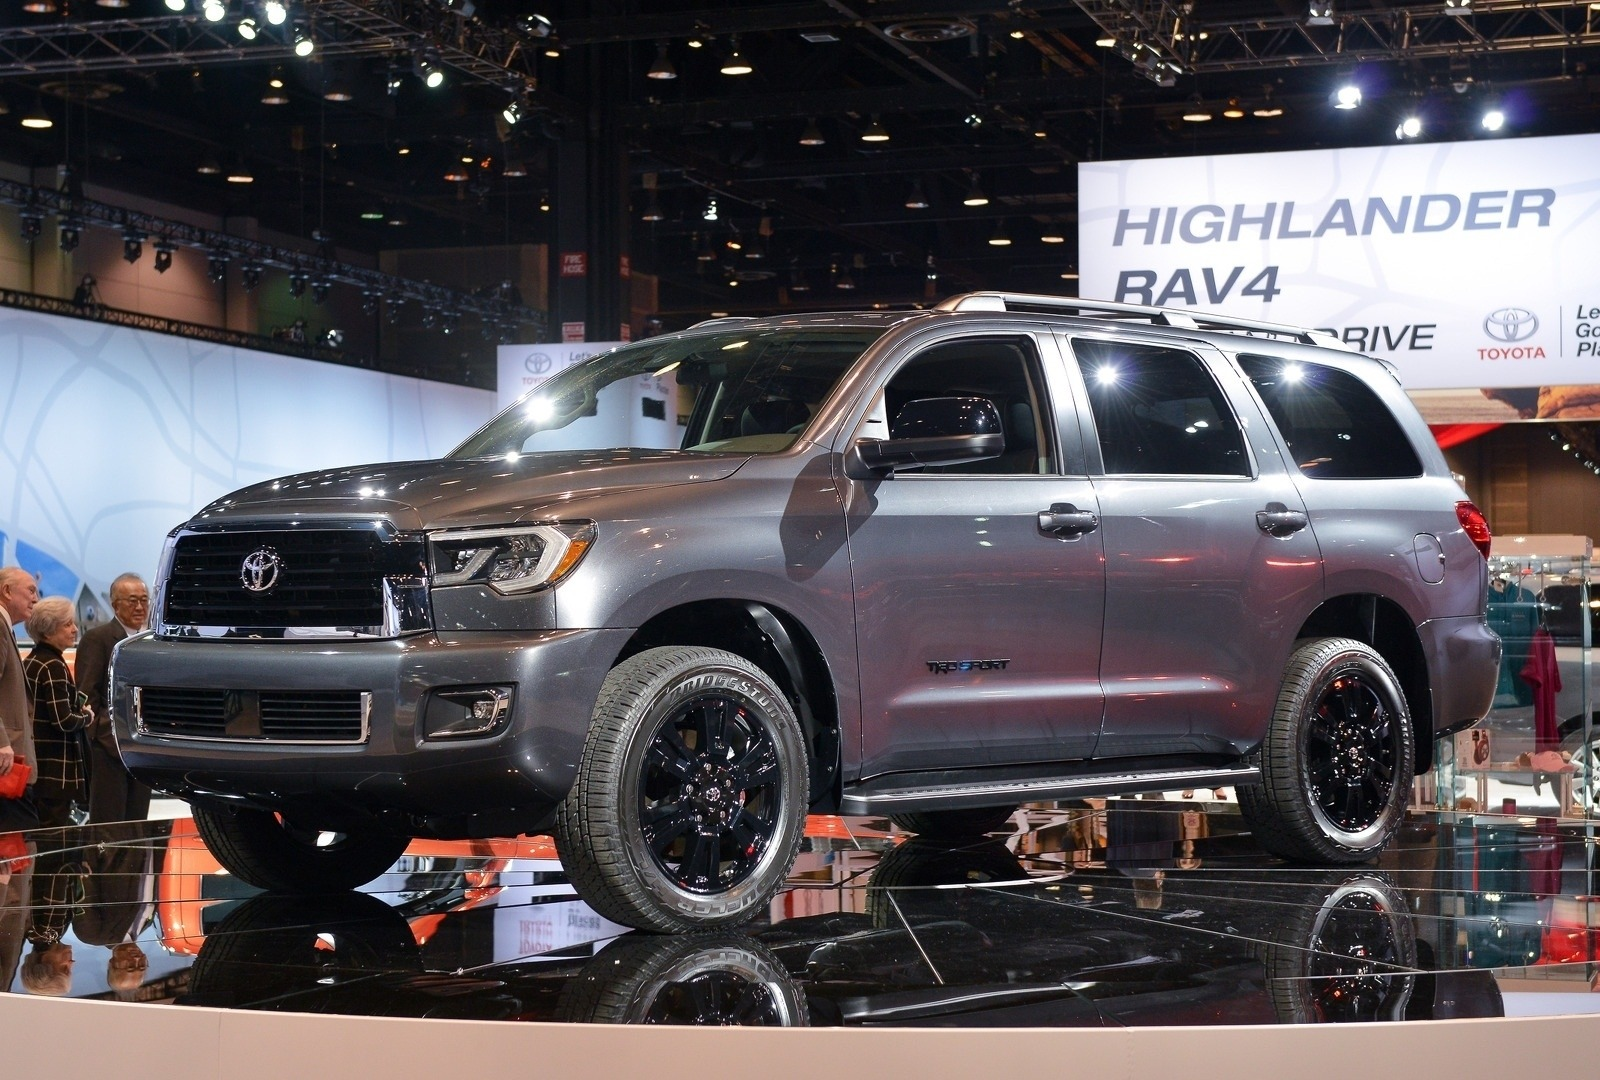 2020 Toyota Highlander Pictures